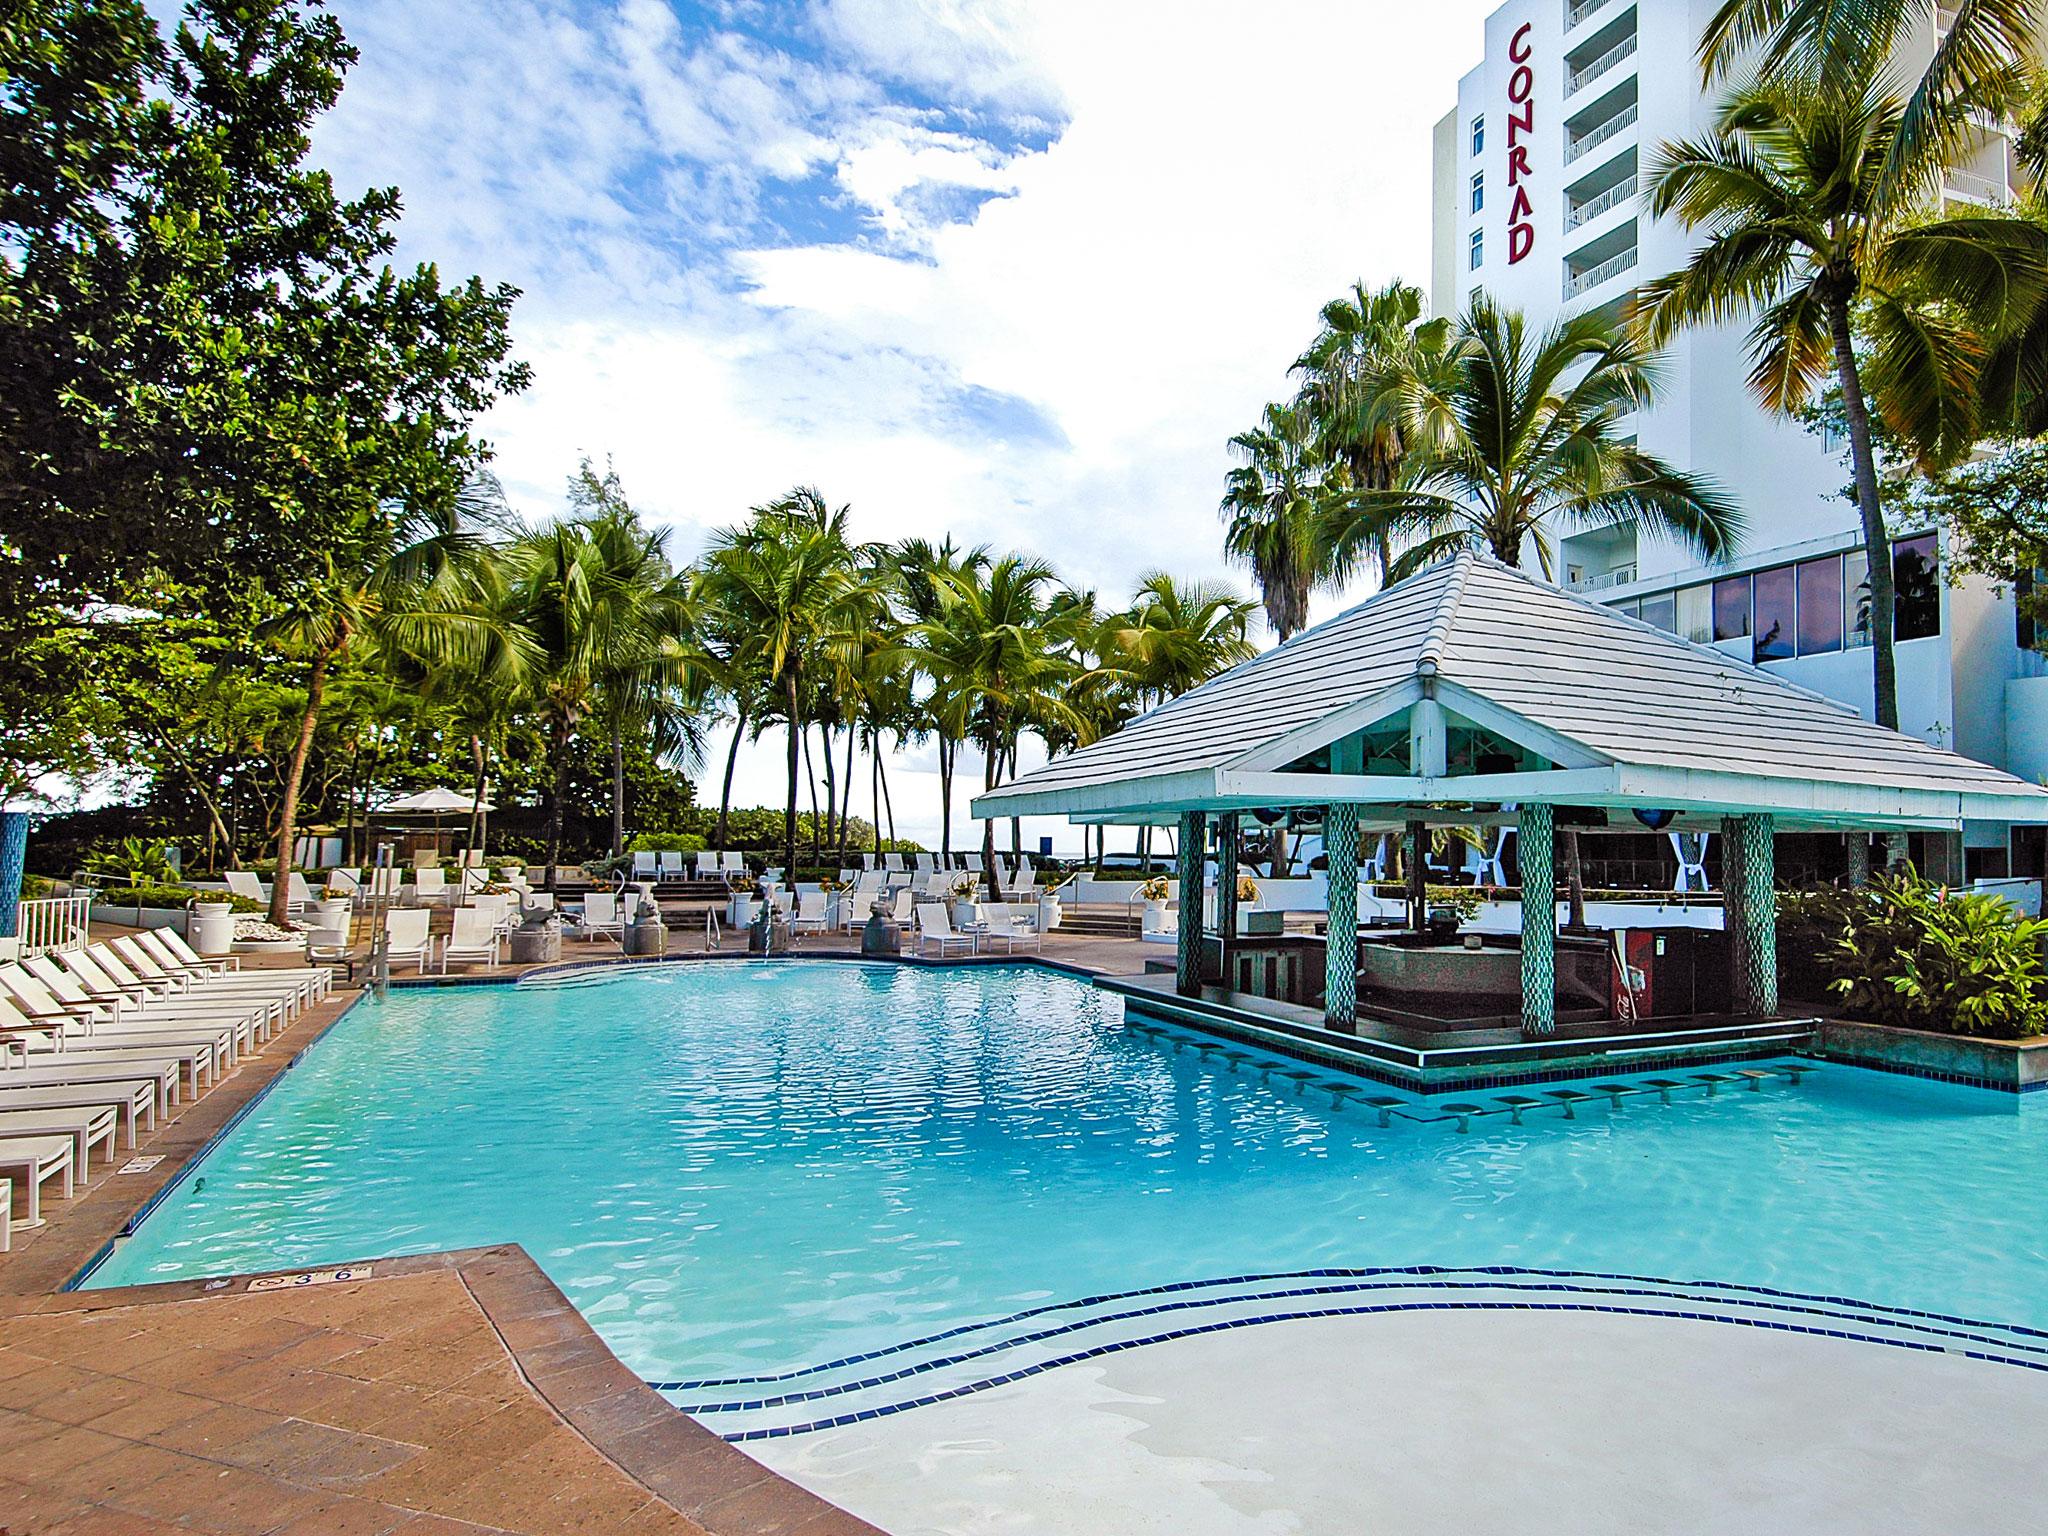 Condado plaza hotel x26 casino reviews no deposit gambling sites